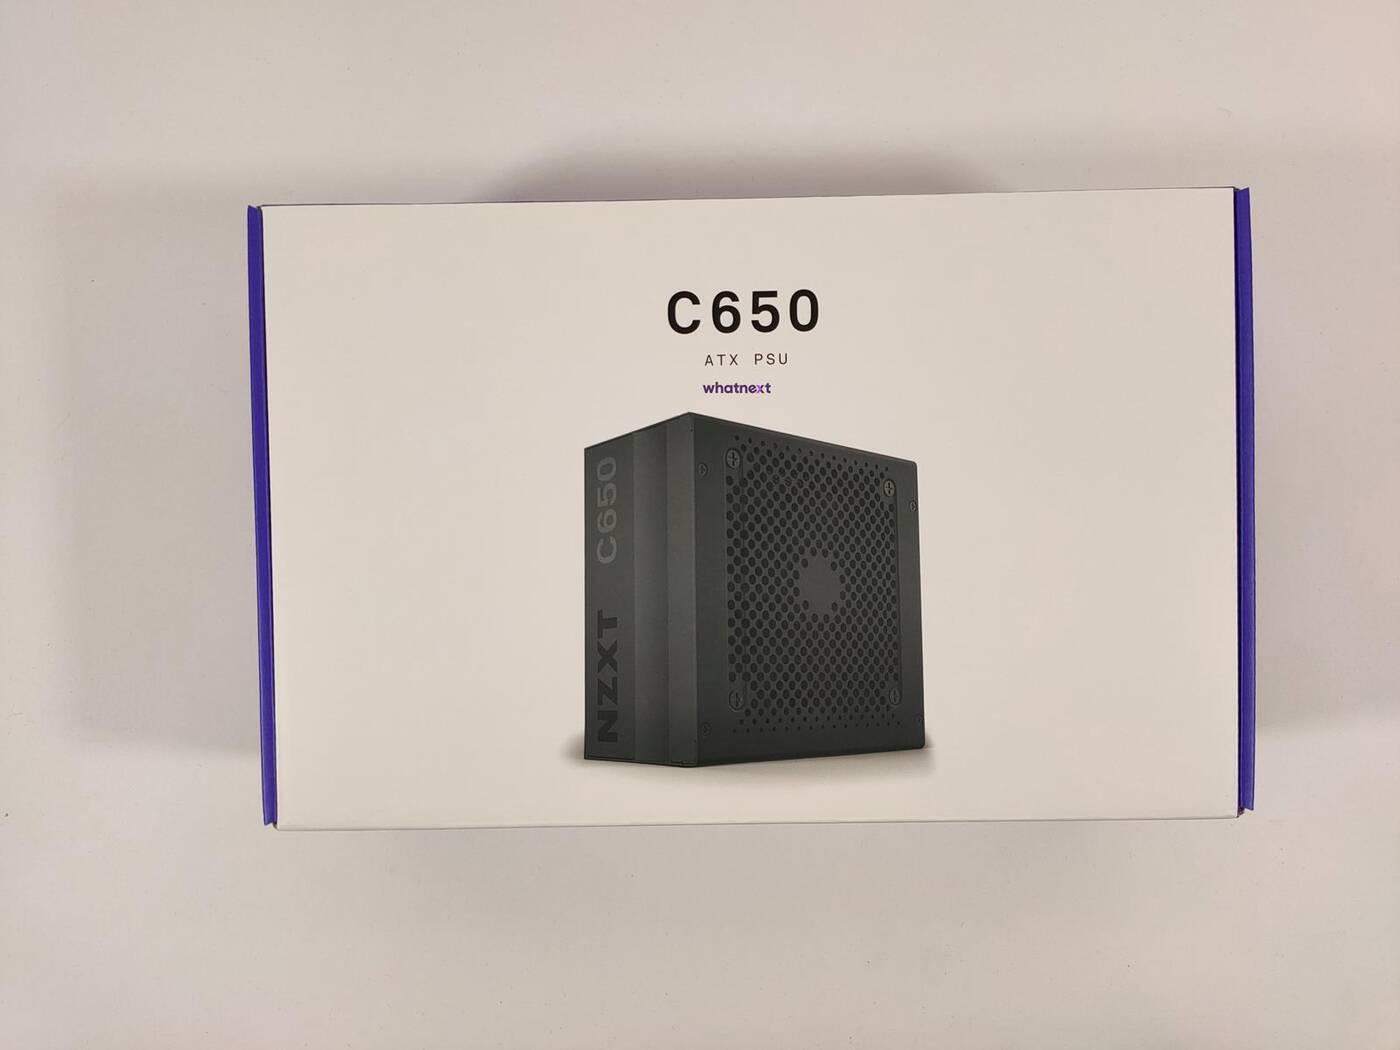 test NZXT C650, recenzja NZXT C650 review NZXT C650, opinia NZXT C650, wydajność NZXT C650, cena NZXT C650